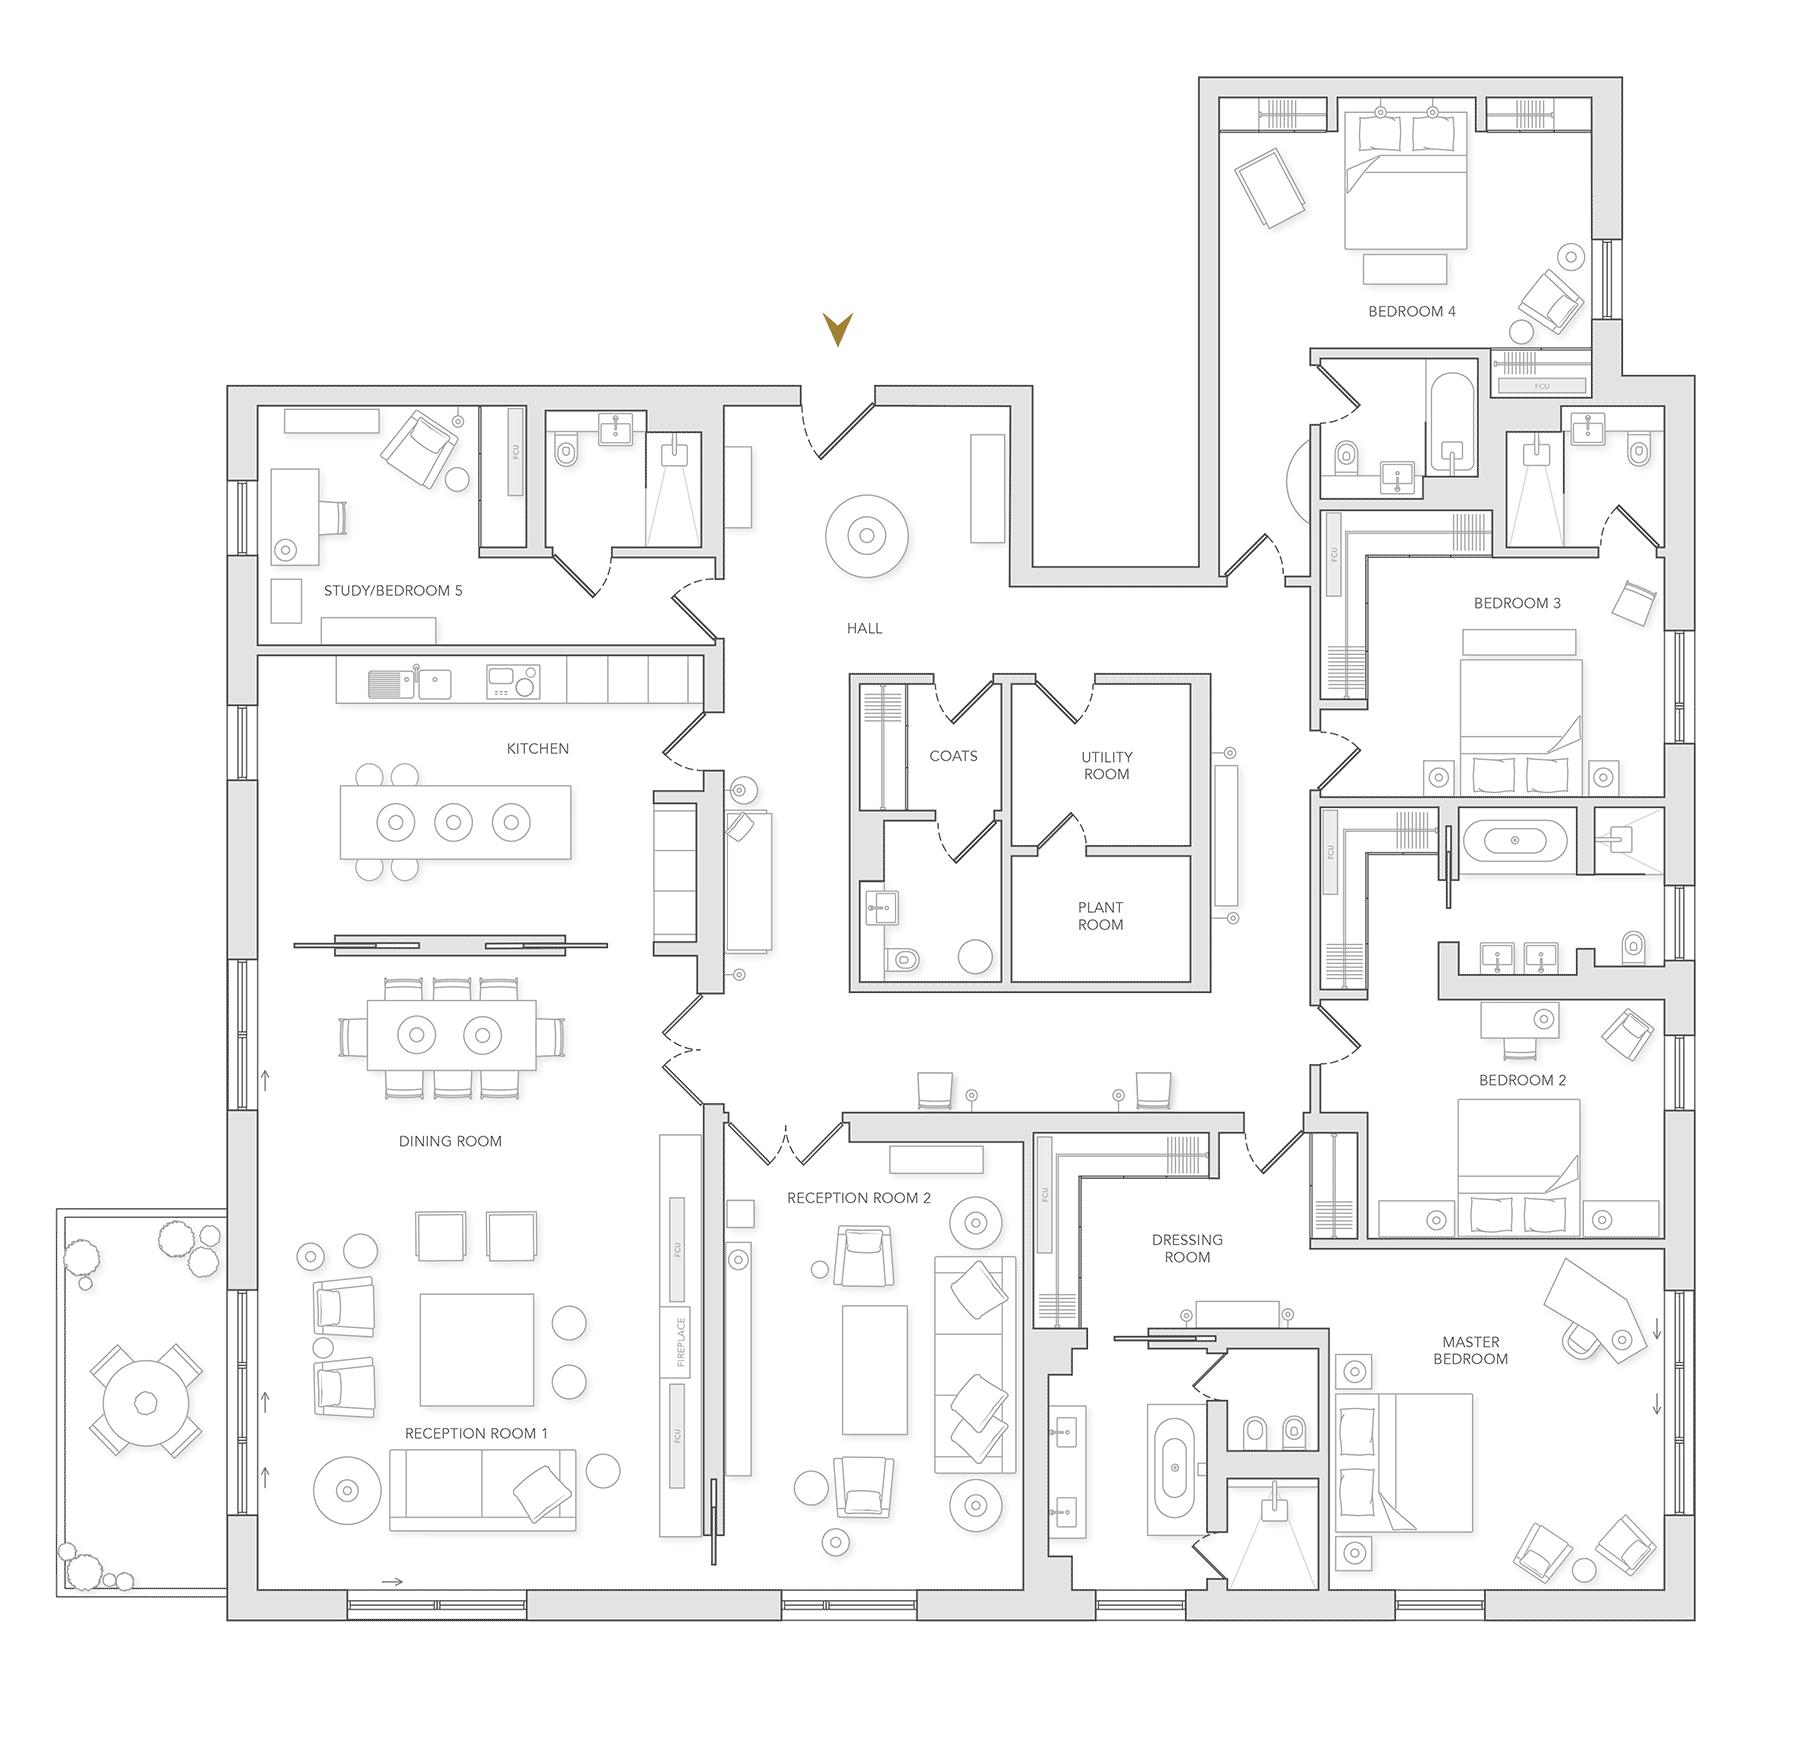 Holland Park Apartments: Luxurious Properties In Kensington